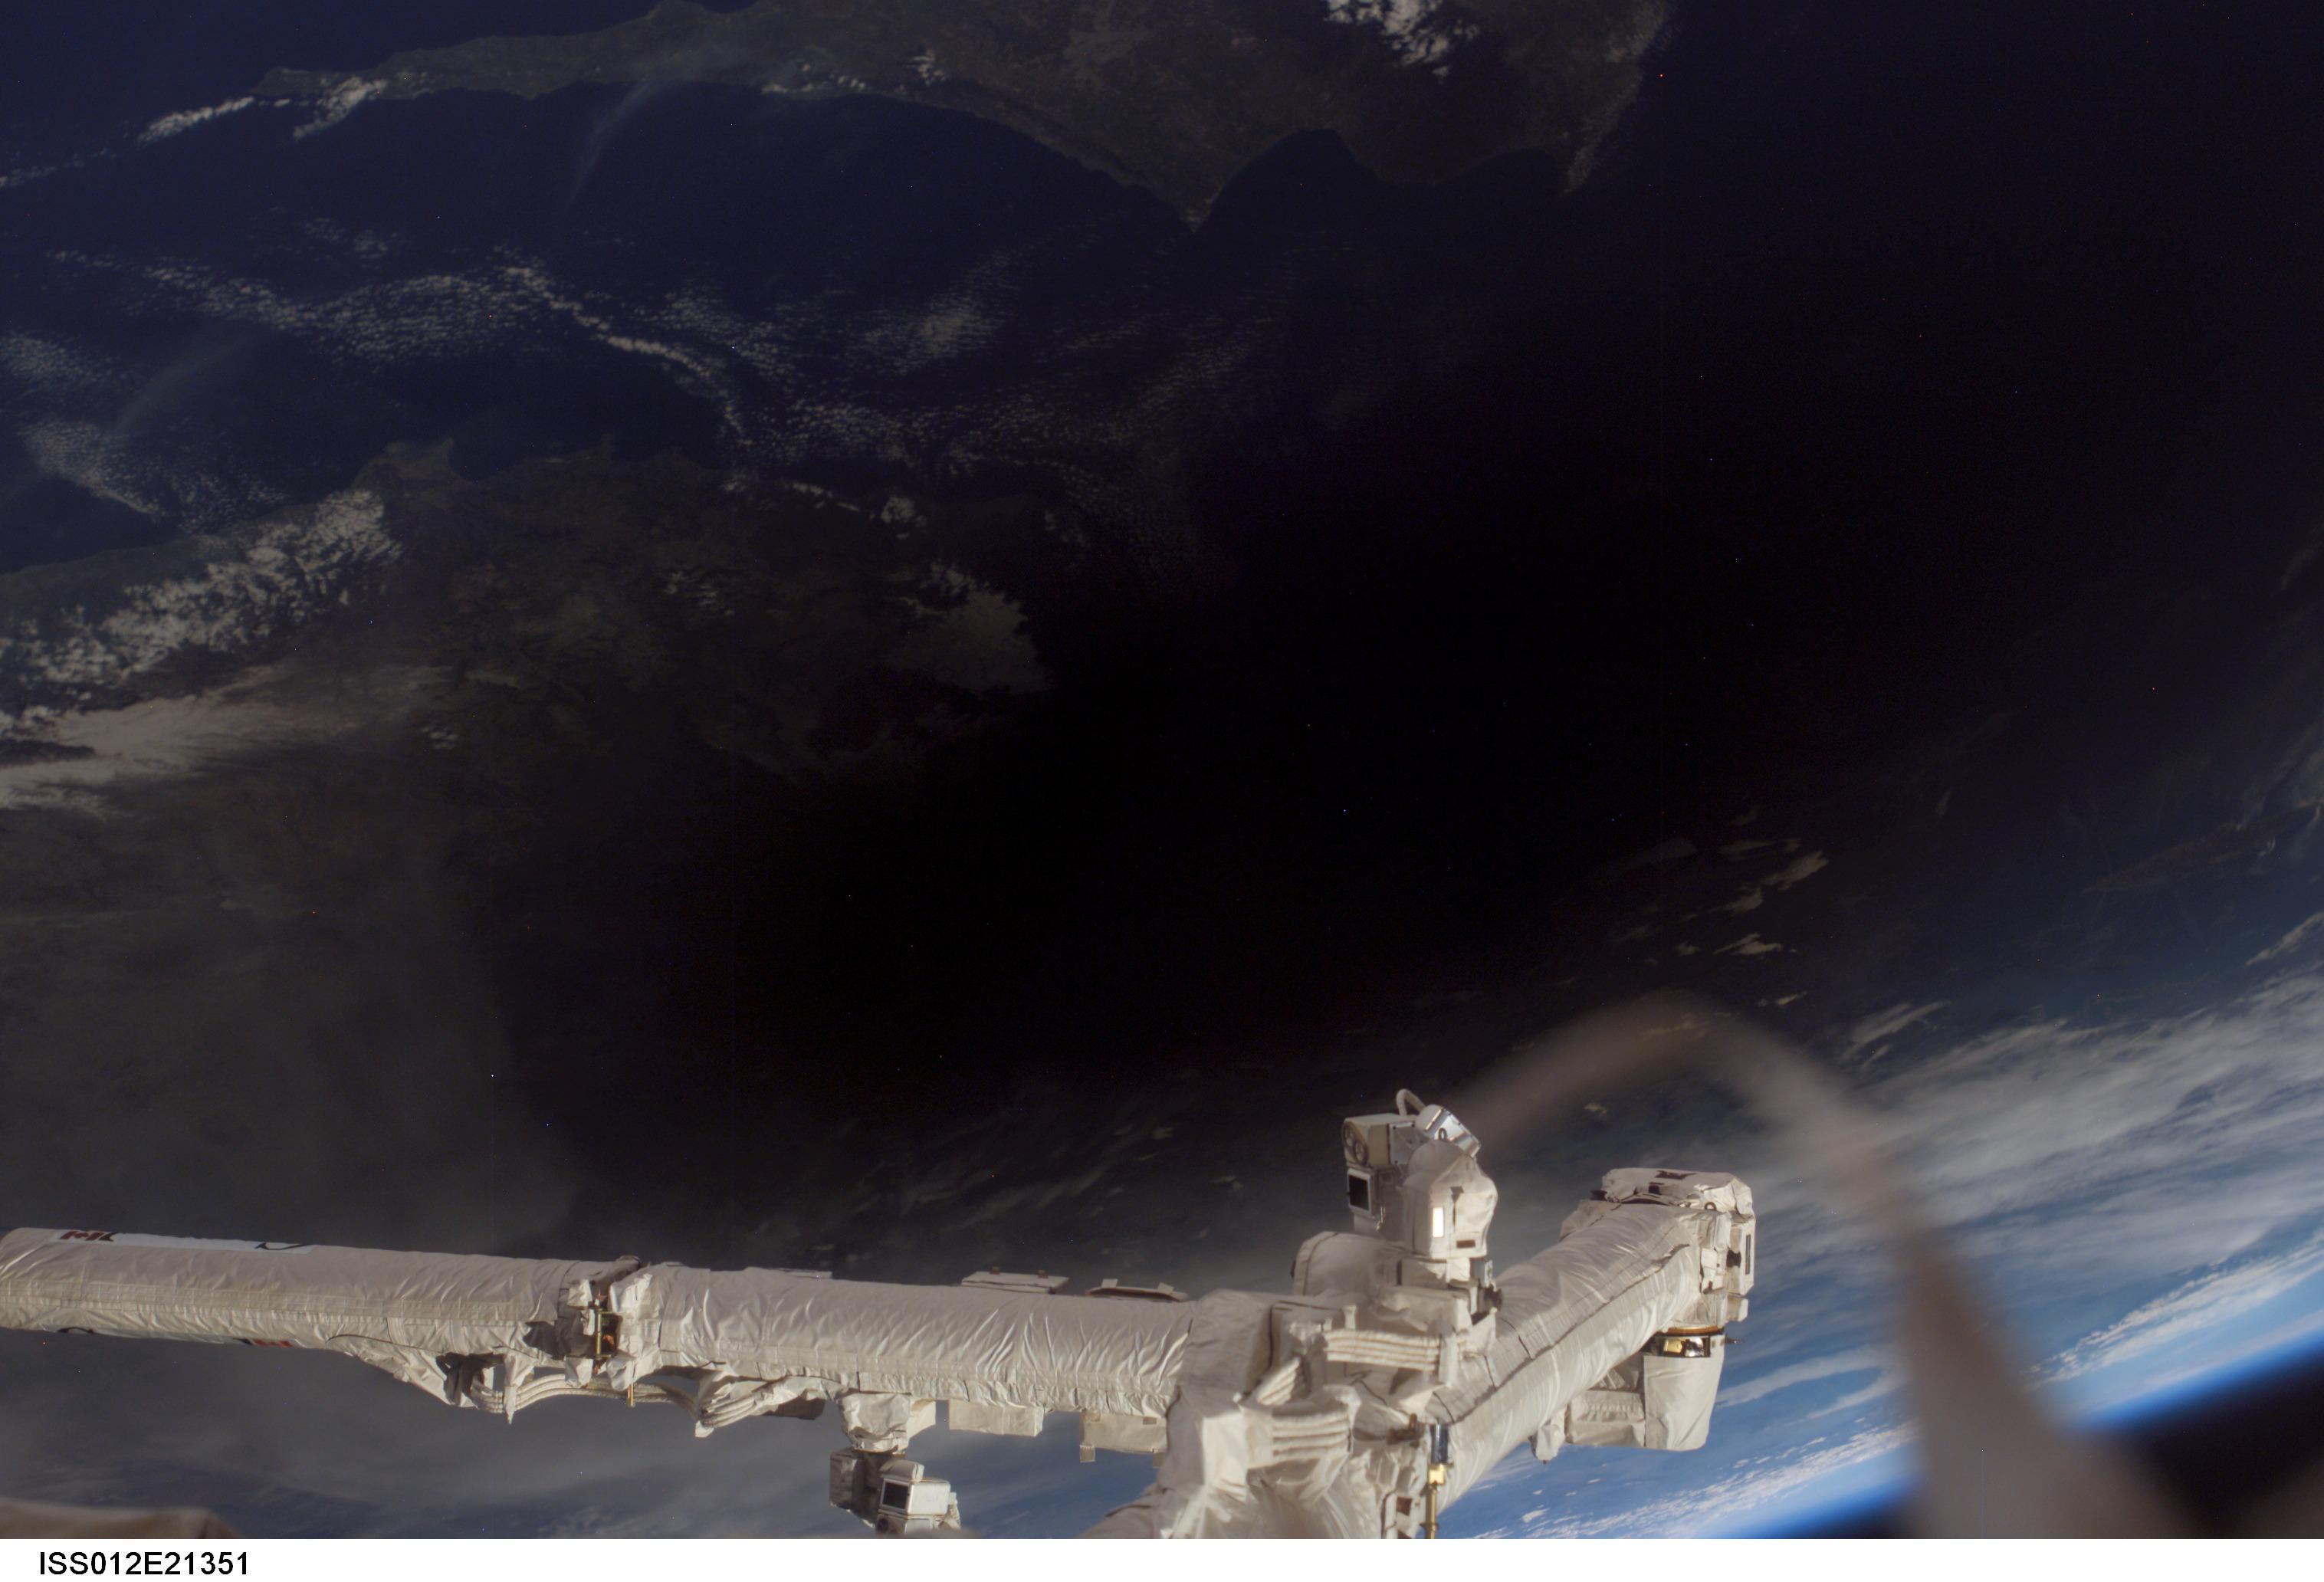 lunar eclipse space station - photo #33